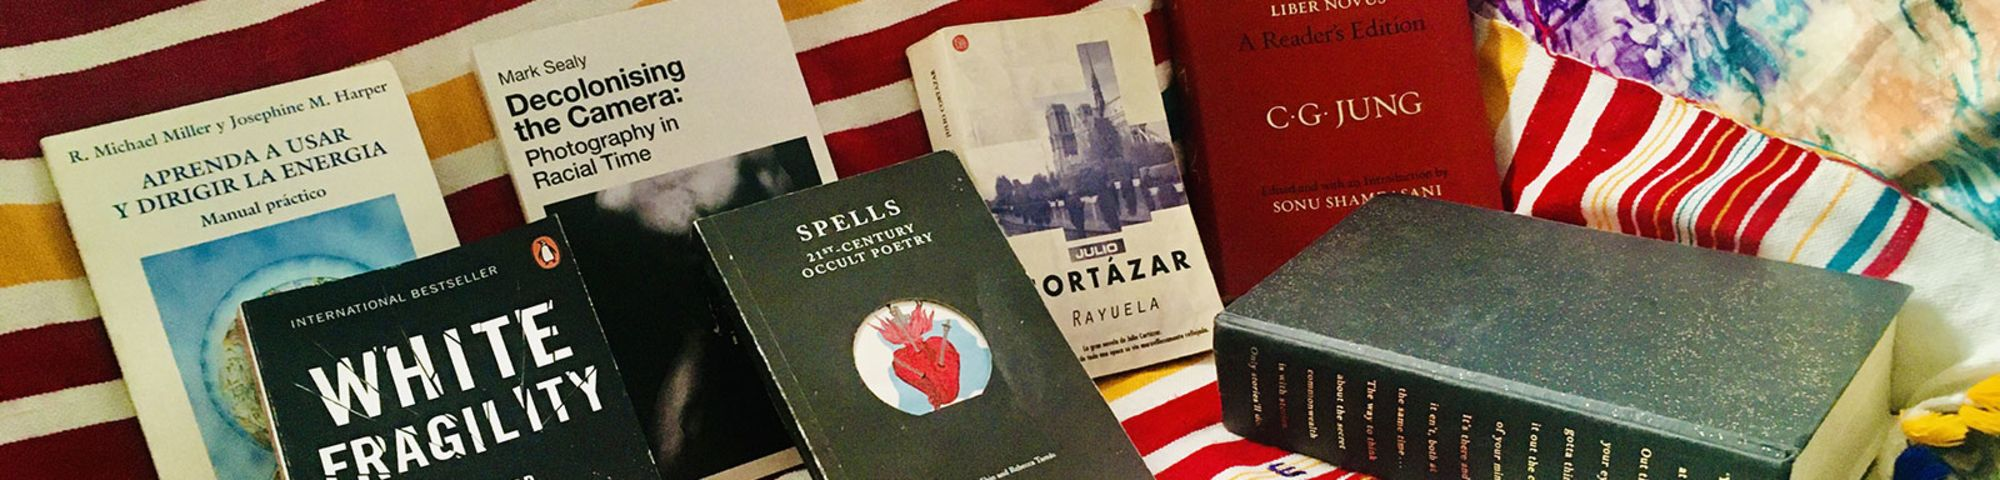 Ana's Bookshelf Picks arranged on a bright and colourful backdrop.